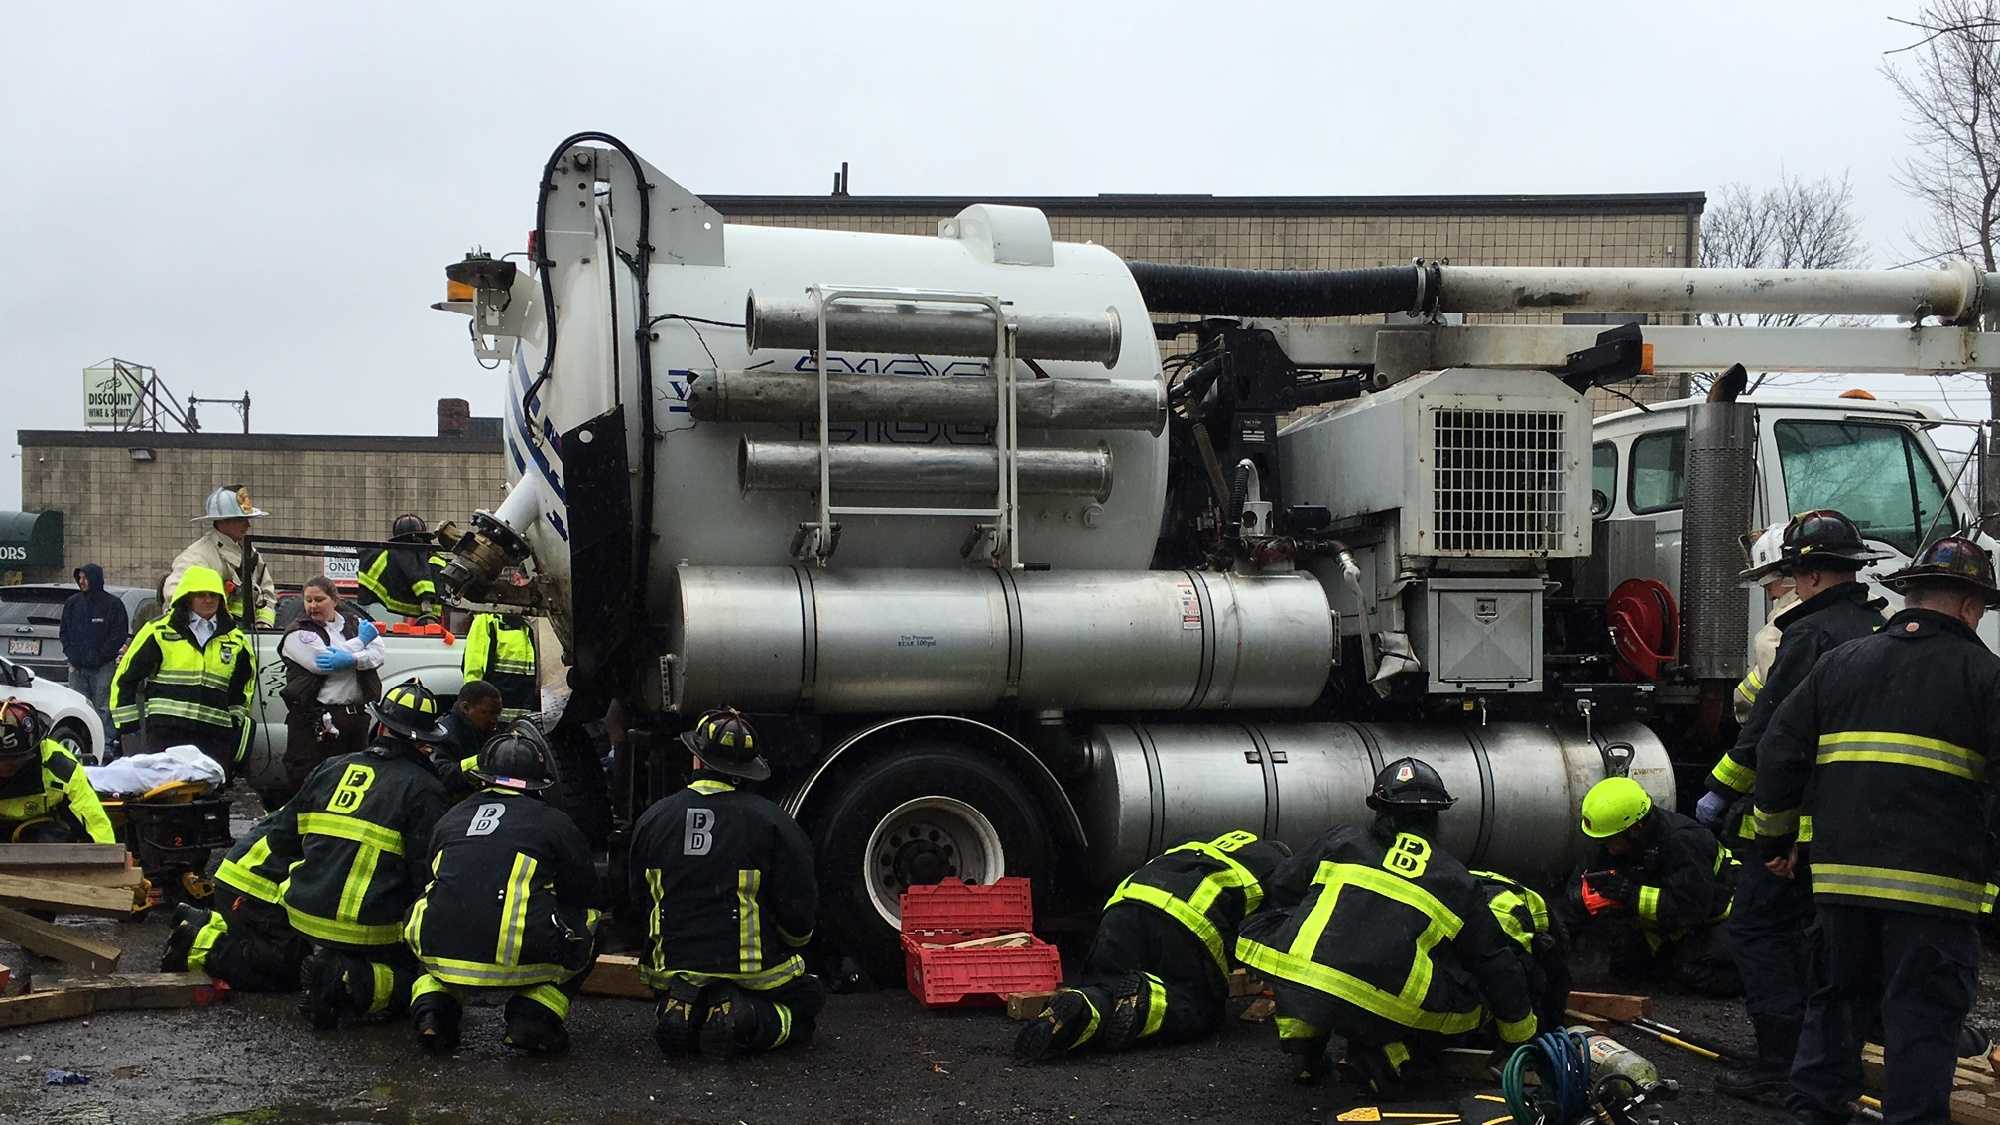 Truck rescue 3.15